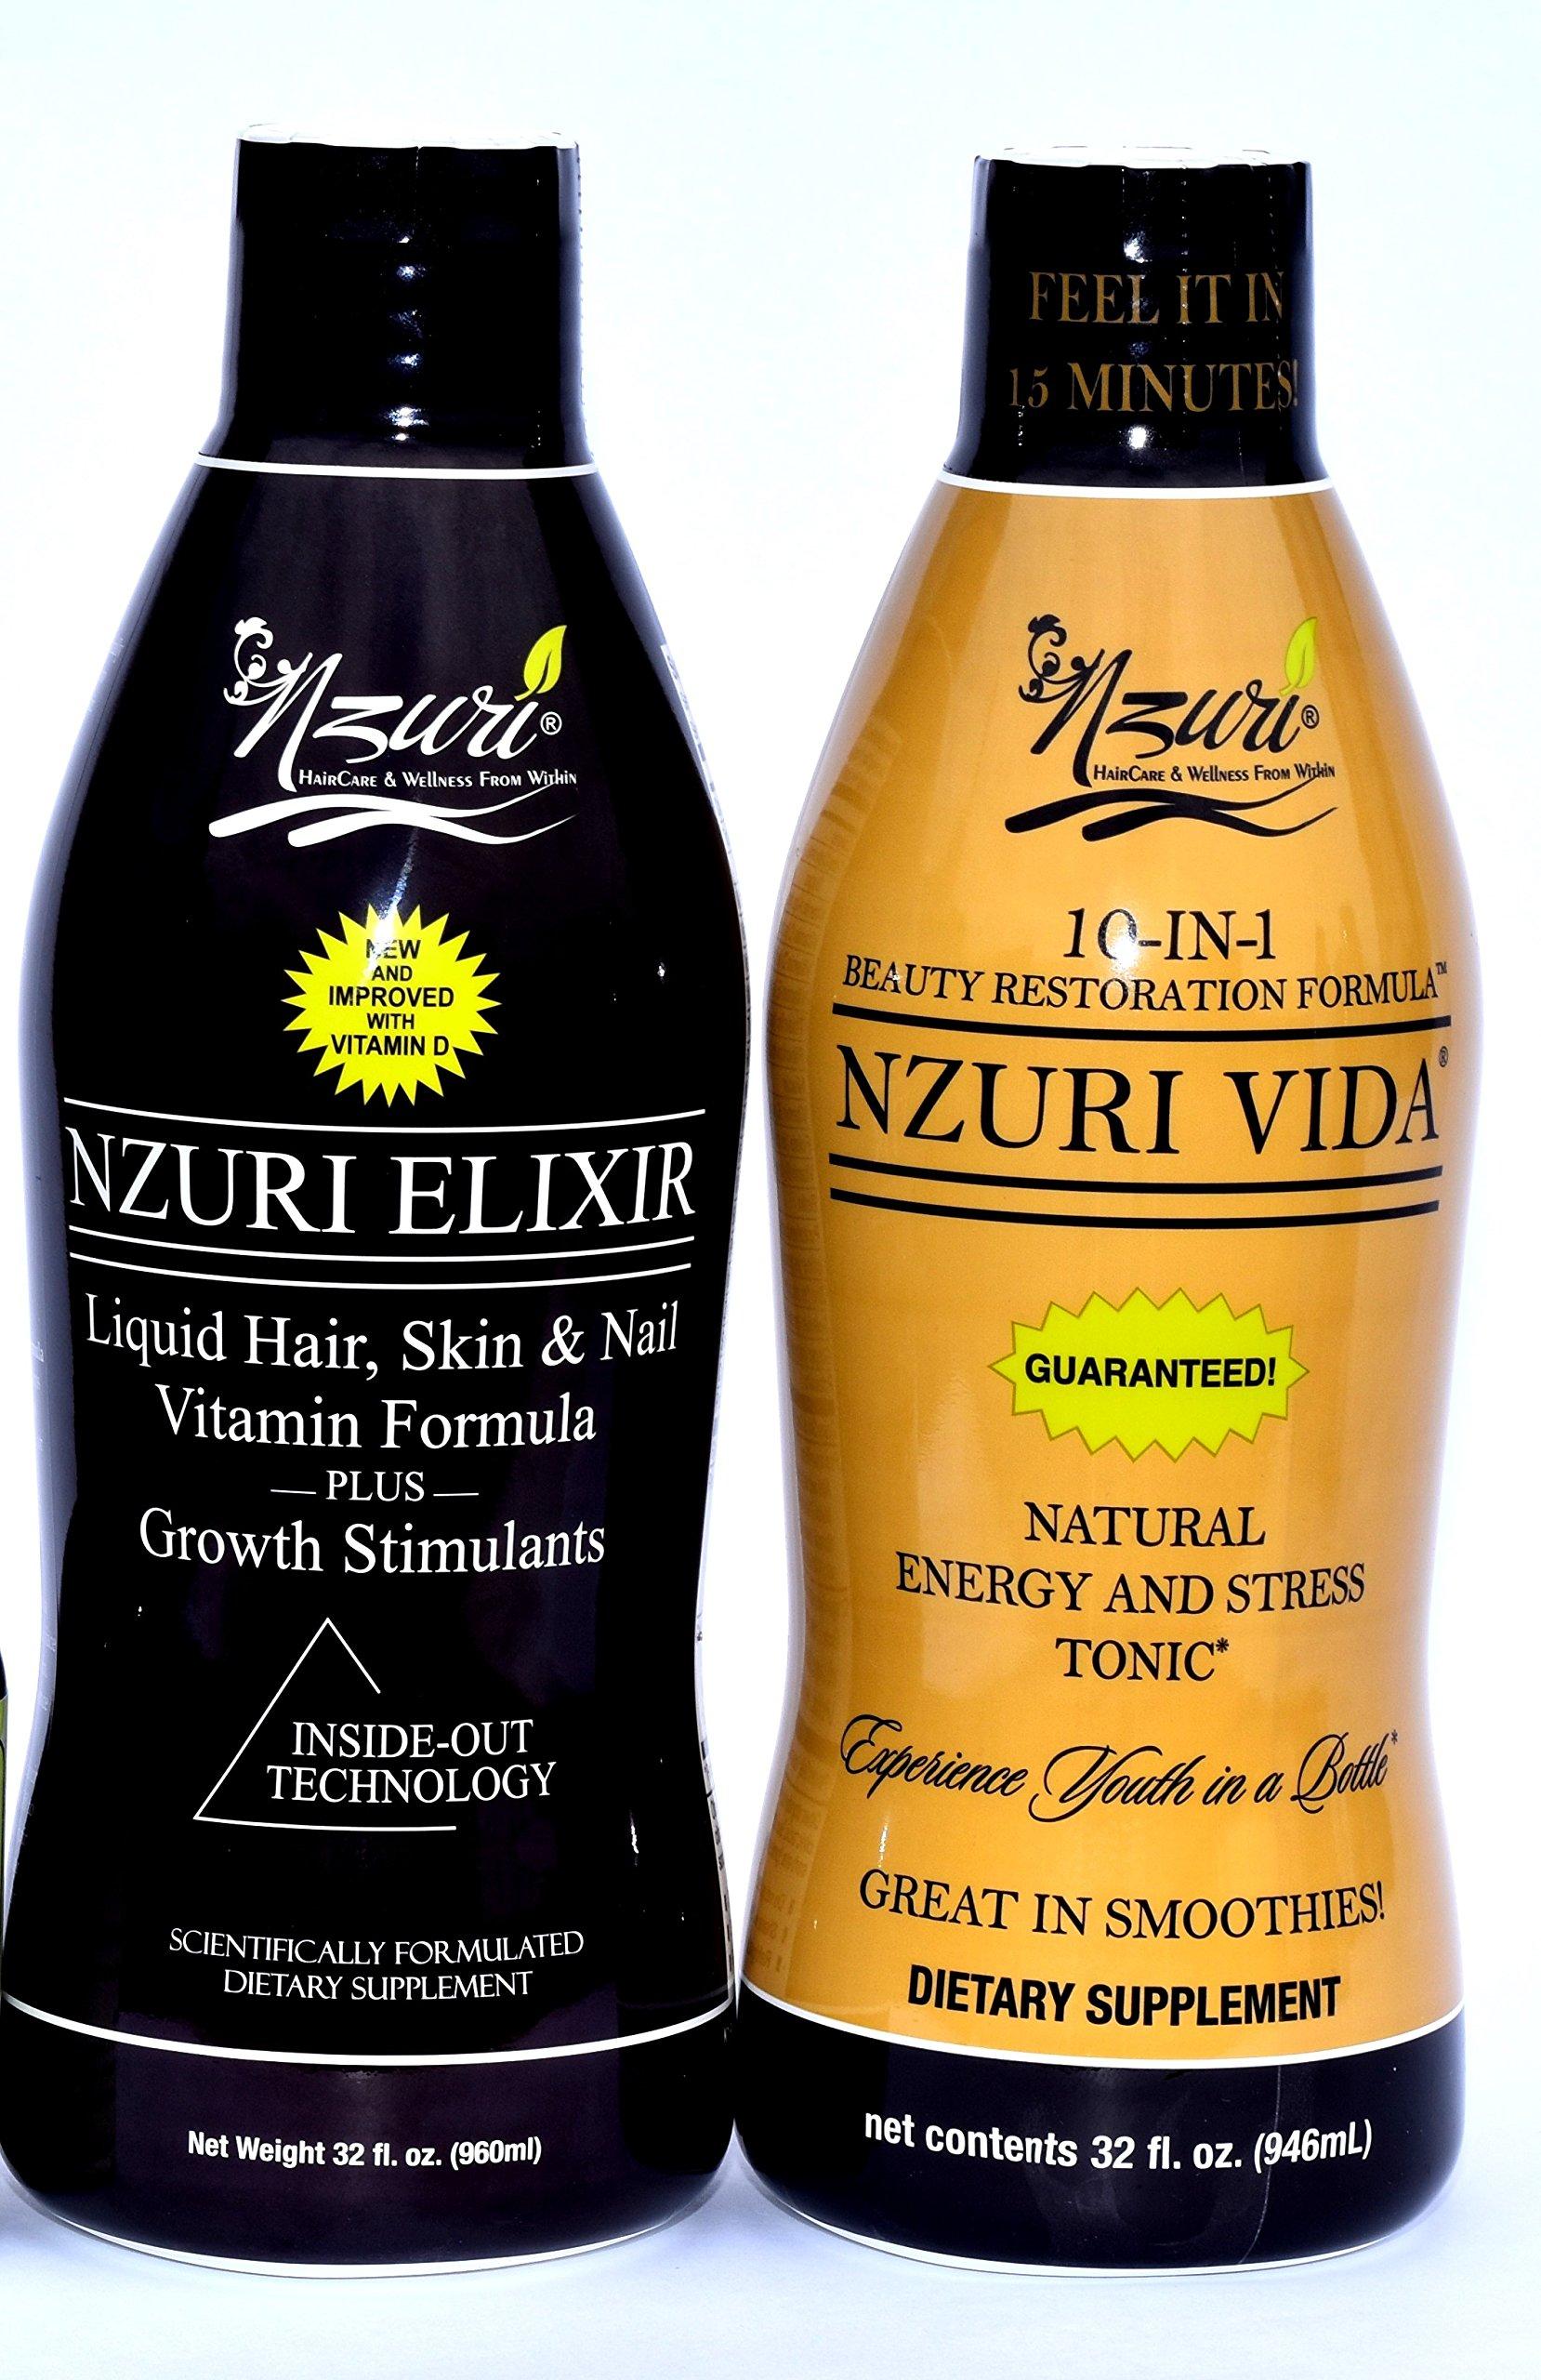 Nzuri Elixir Liquid Hair Vitamins Hair Regrowth 32 Oz Bottle + Nzuri Vida Energy and Stress Tonic 30 Oz Bottle - The Perfect Duo by Nzuri